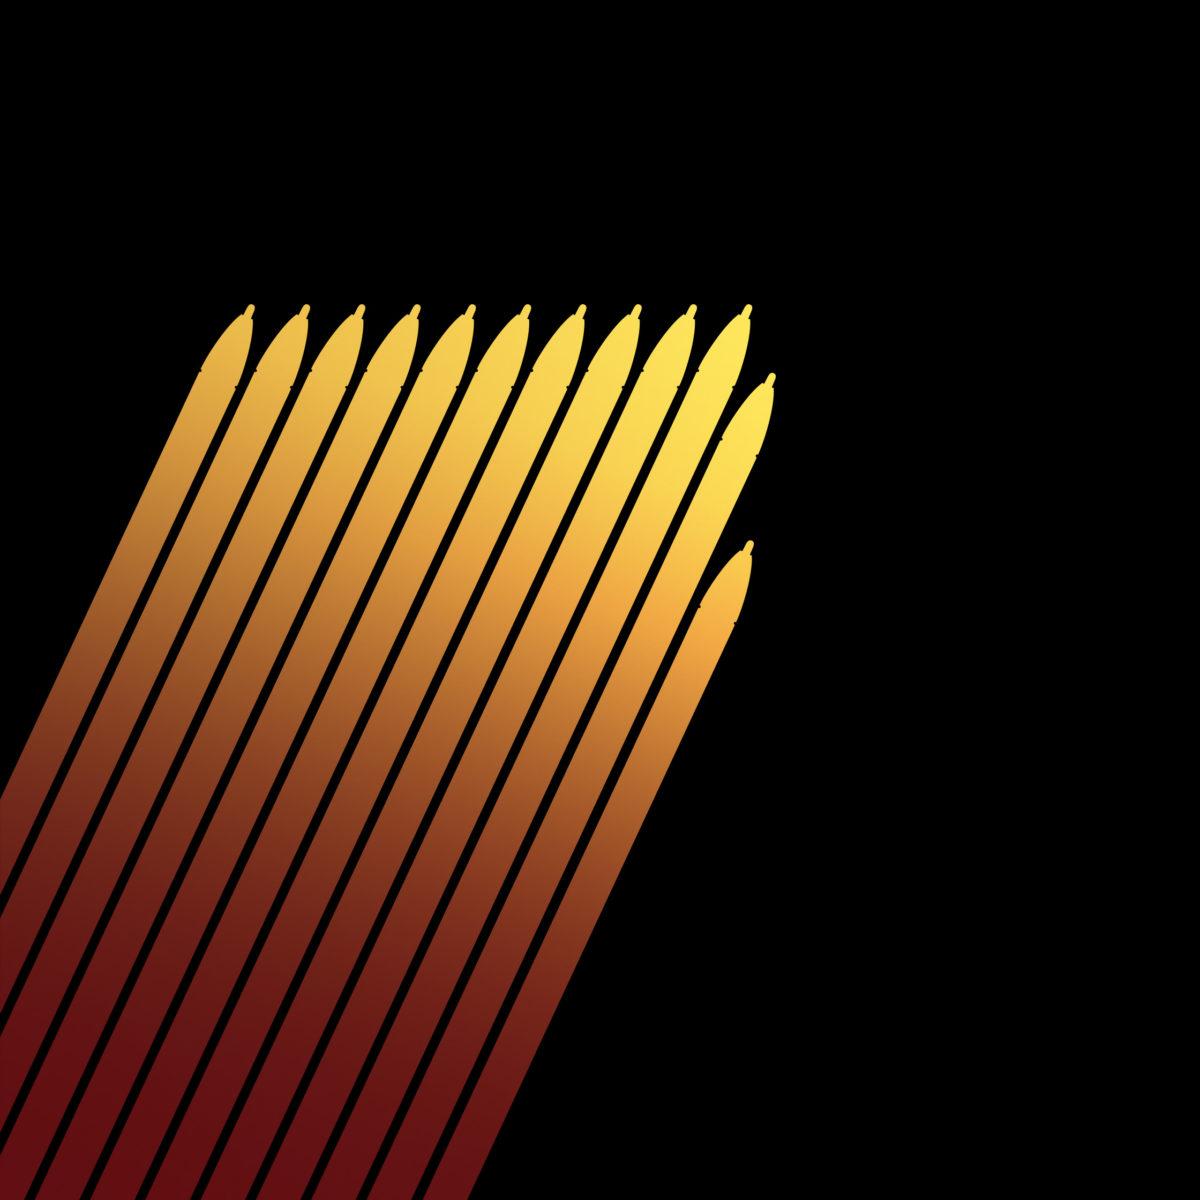 samsung_galaxy_note_7-essential_built_in_wallpaper-gold-1200x1200